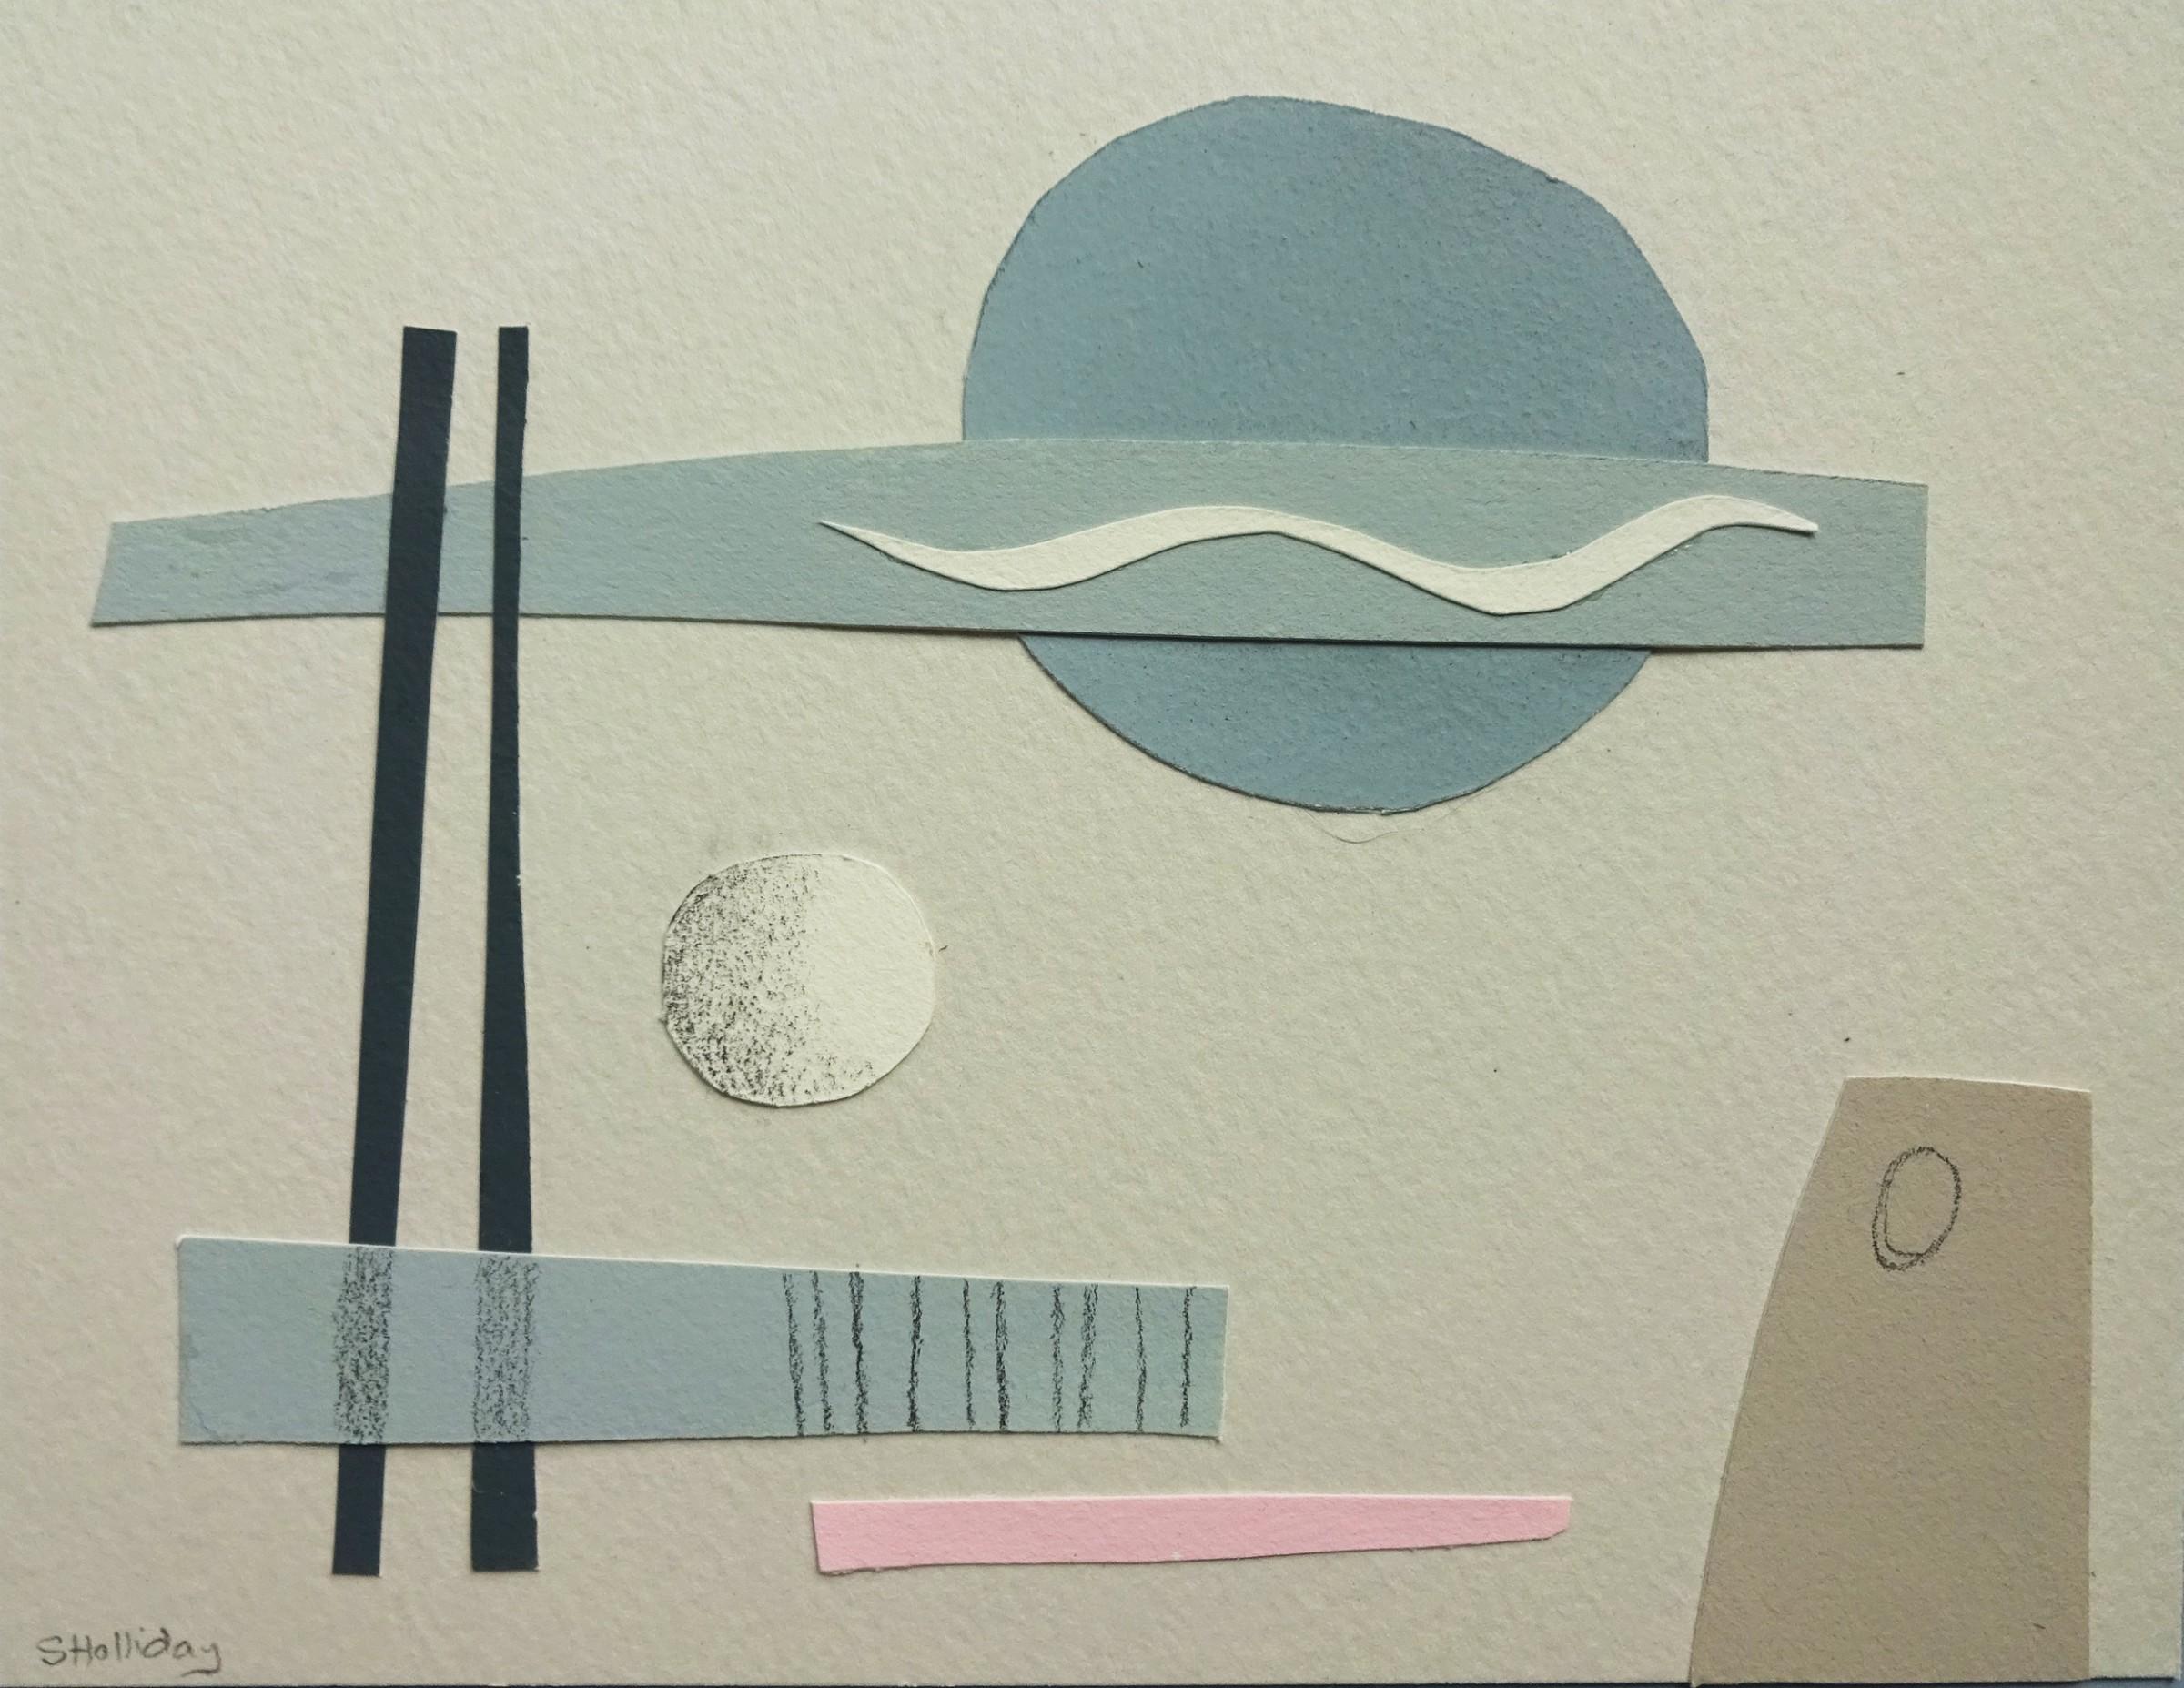 "<span class=""link fancybox-details-link""><a href=""/artists/70-sarah-holliday/works/12230-sarah-holliday-day-moon/"">View Detail Page</a></span><div class=""artist""><span class=""artist""><strong>Sarah Holliday</strong></span></div><div class=""title""><em>Day Moon</em></div><div class=""medium"">watercolour collage</div><div class=""dimensions"">Frame: 19 x 23 cm<br /> Artwork: 13 x 17 cm</div><div class=""price"">£175.00</div>"